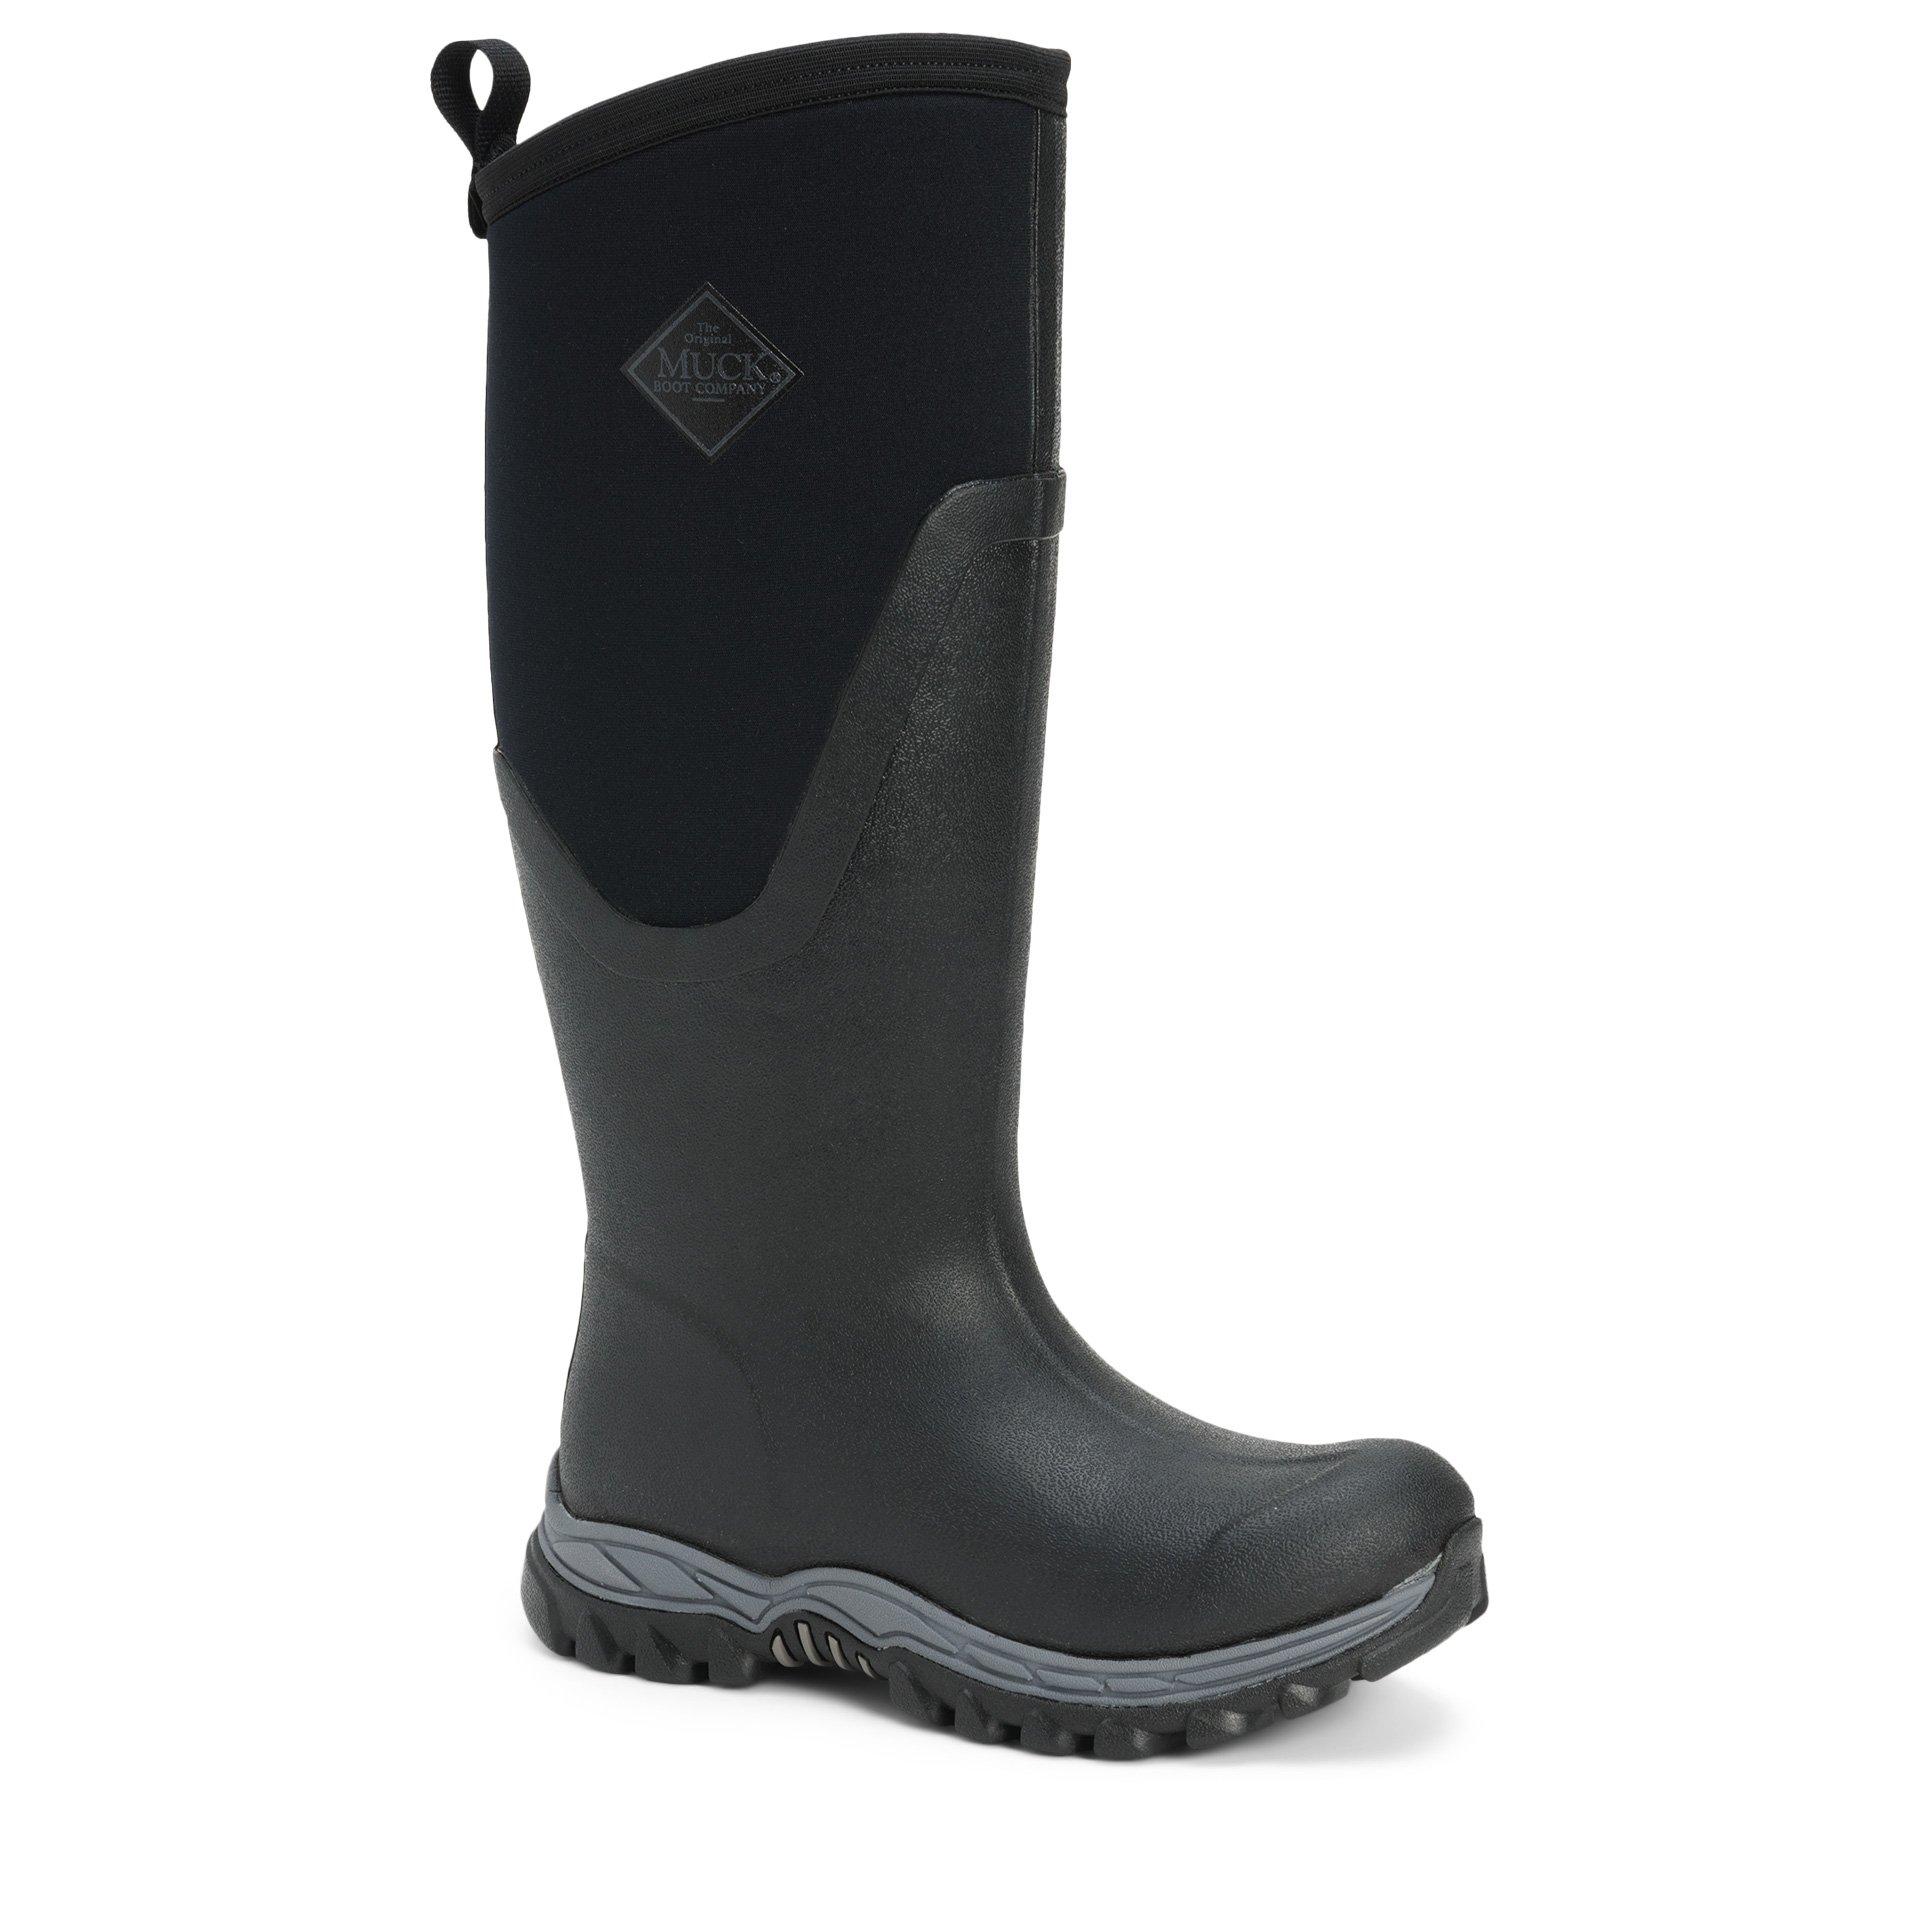 Muck Boot Arctic Sport II High talvisaapas musta 6 39/40